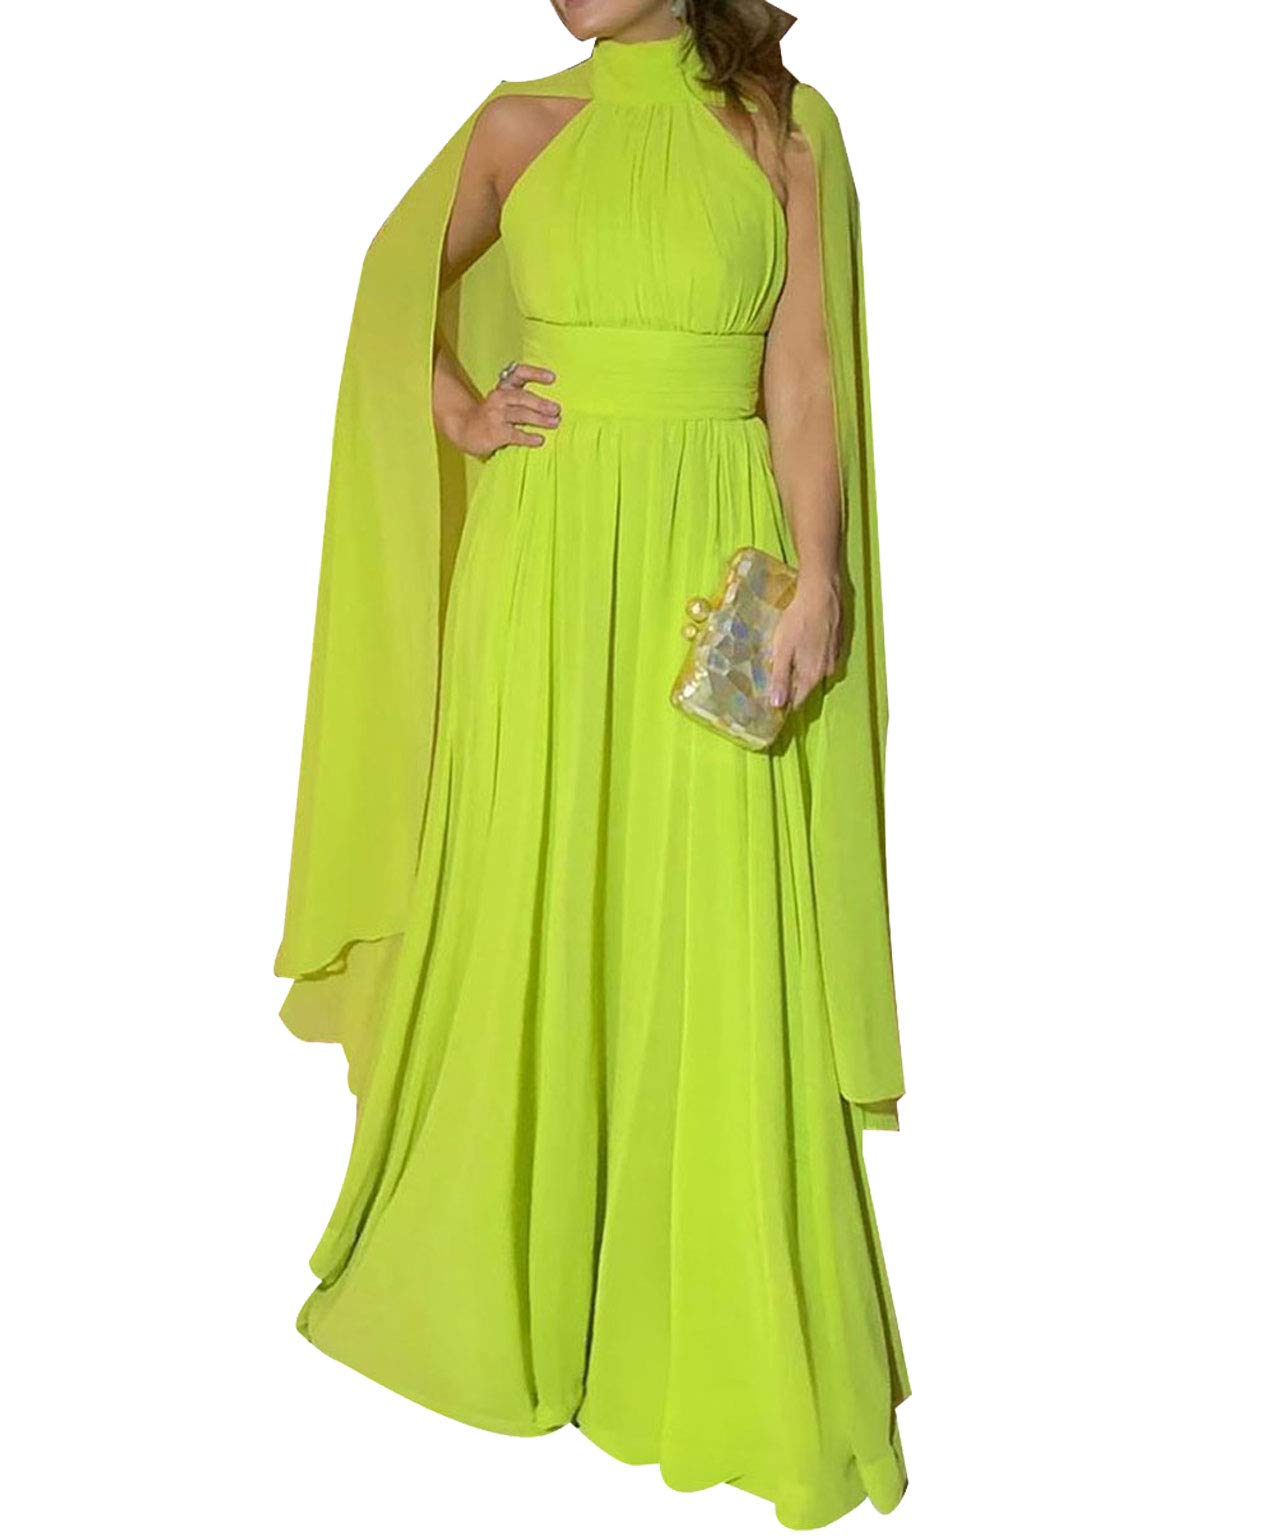 Available at Amazon: VERWIN Long Sleeve Round Neck Patchwork Plain Women's Bodycon Dress Flare Sleeve Midi Dress